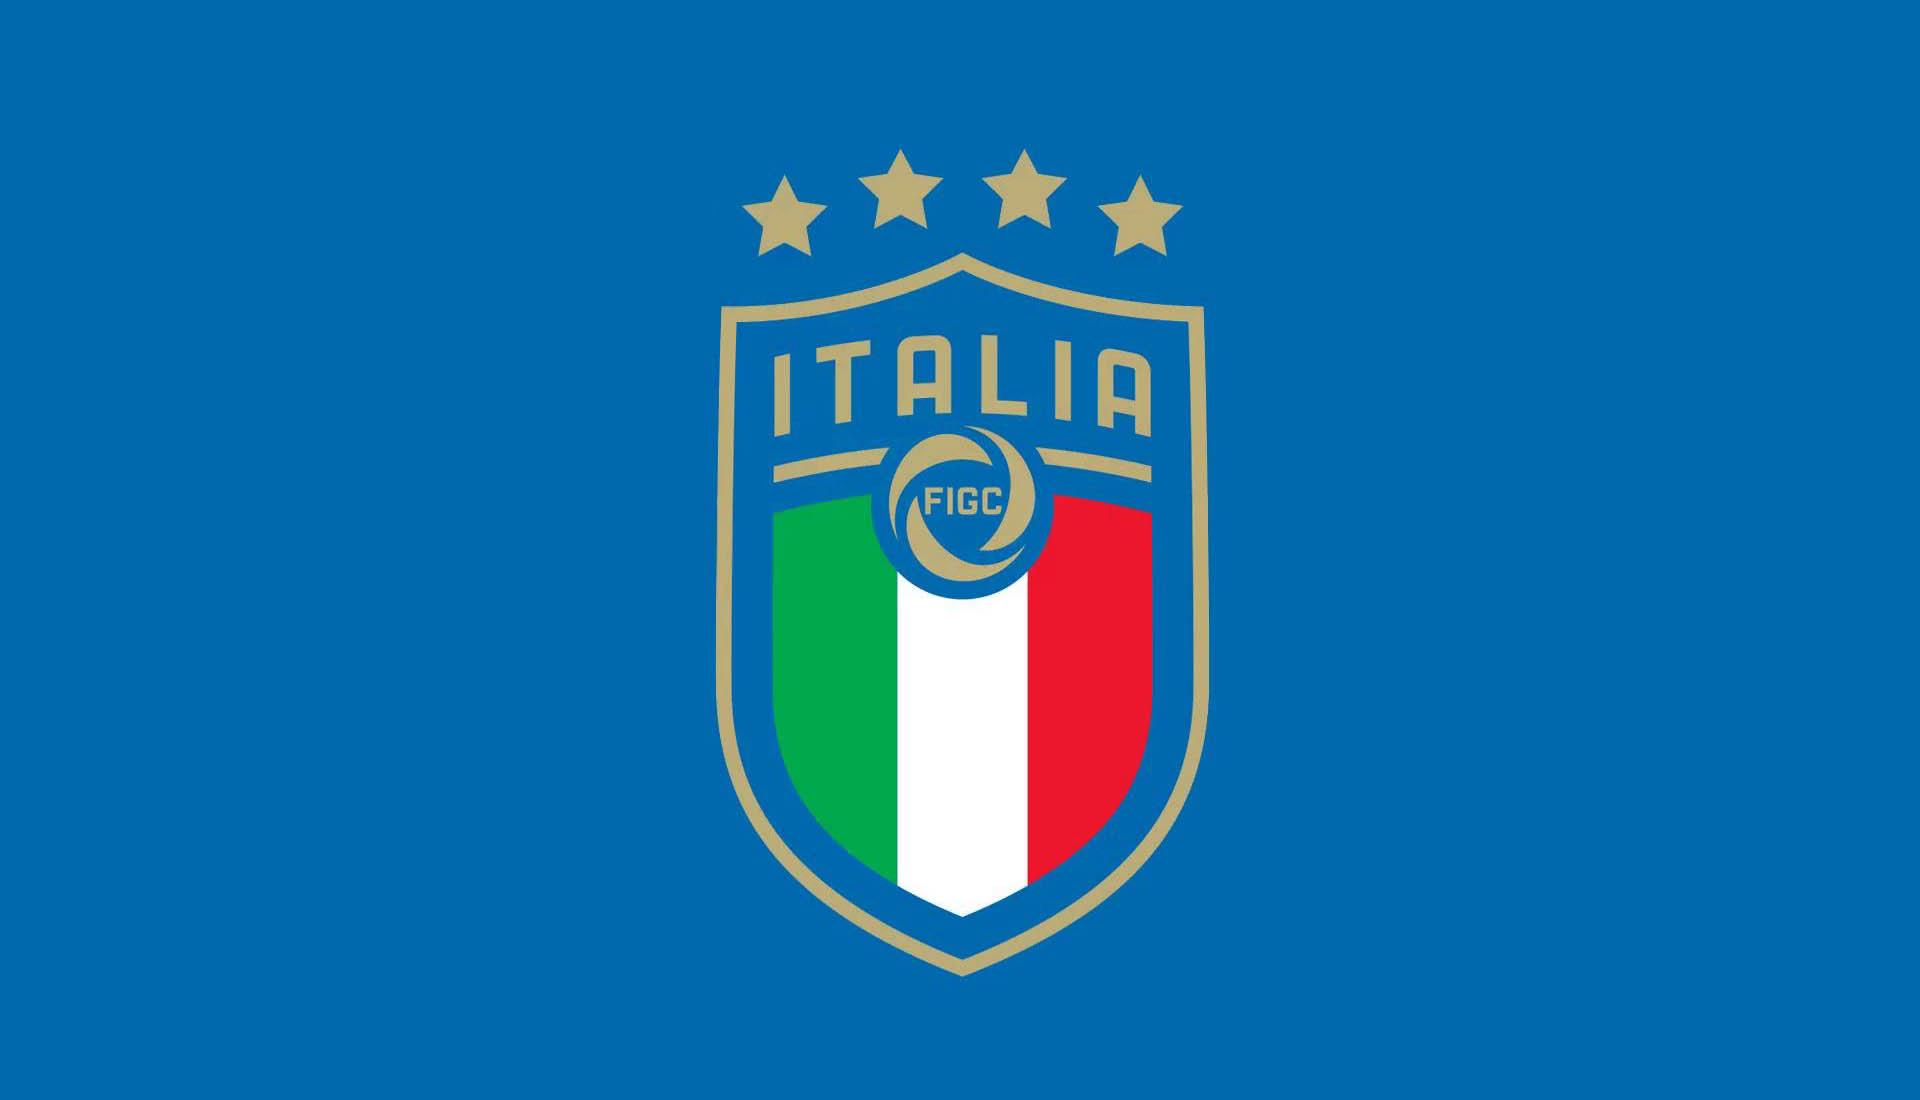 italian national team launch new crest soccerbible rh soccerbible com